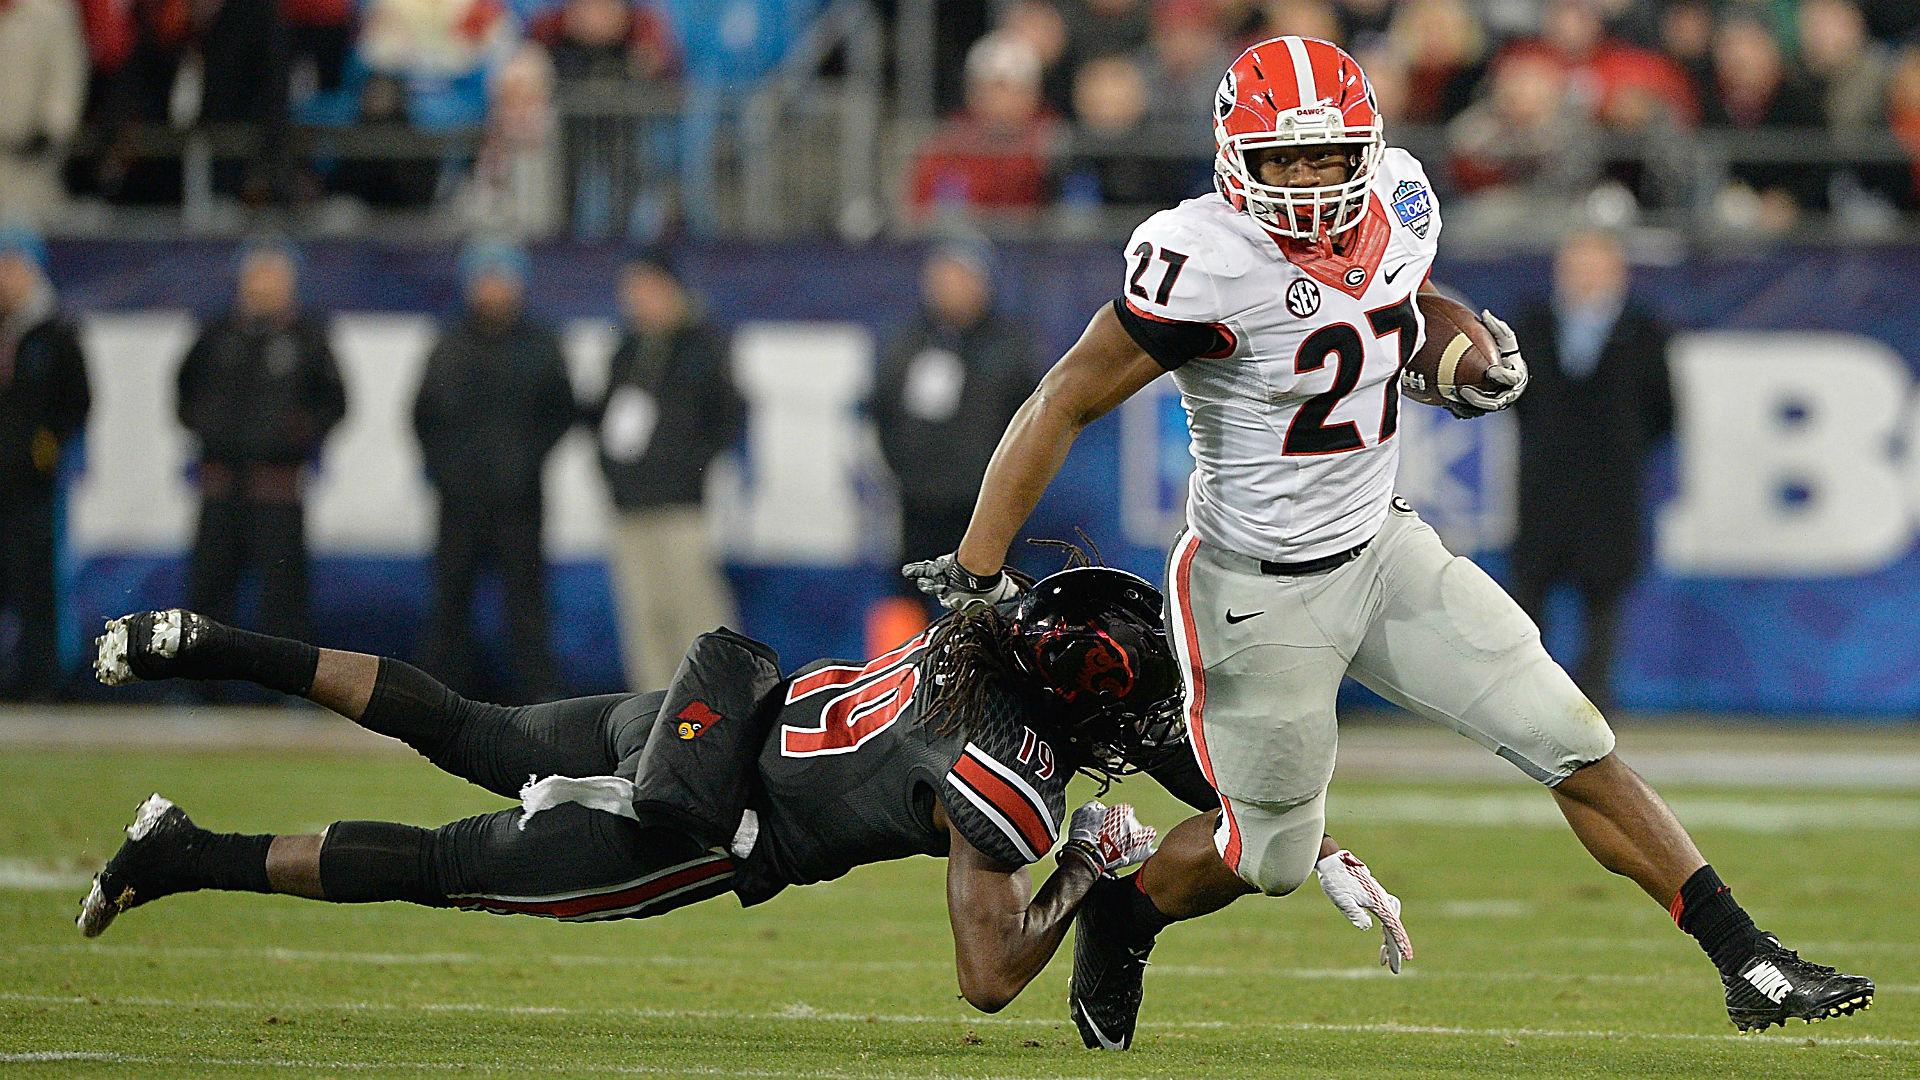 cfb top 25 college football fantasy picks